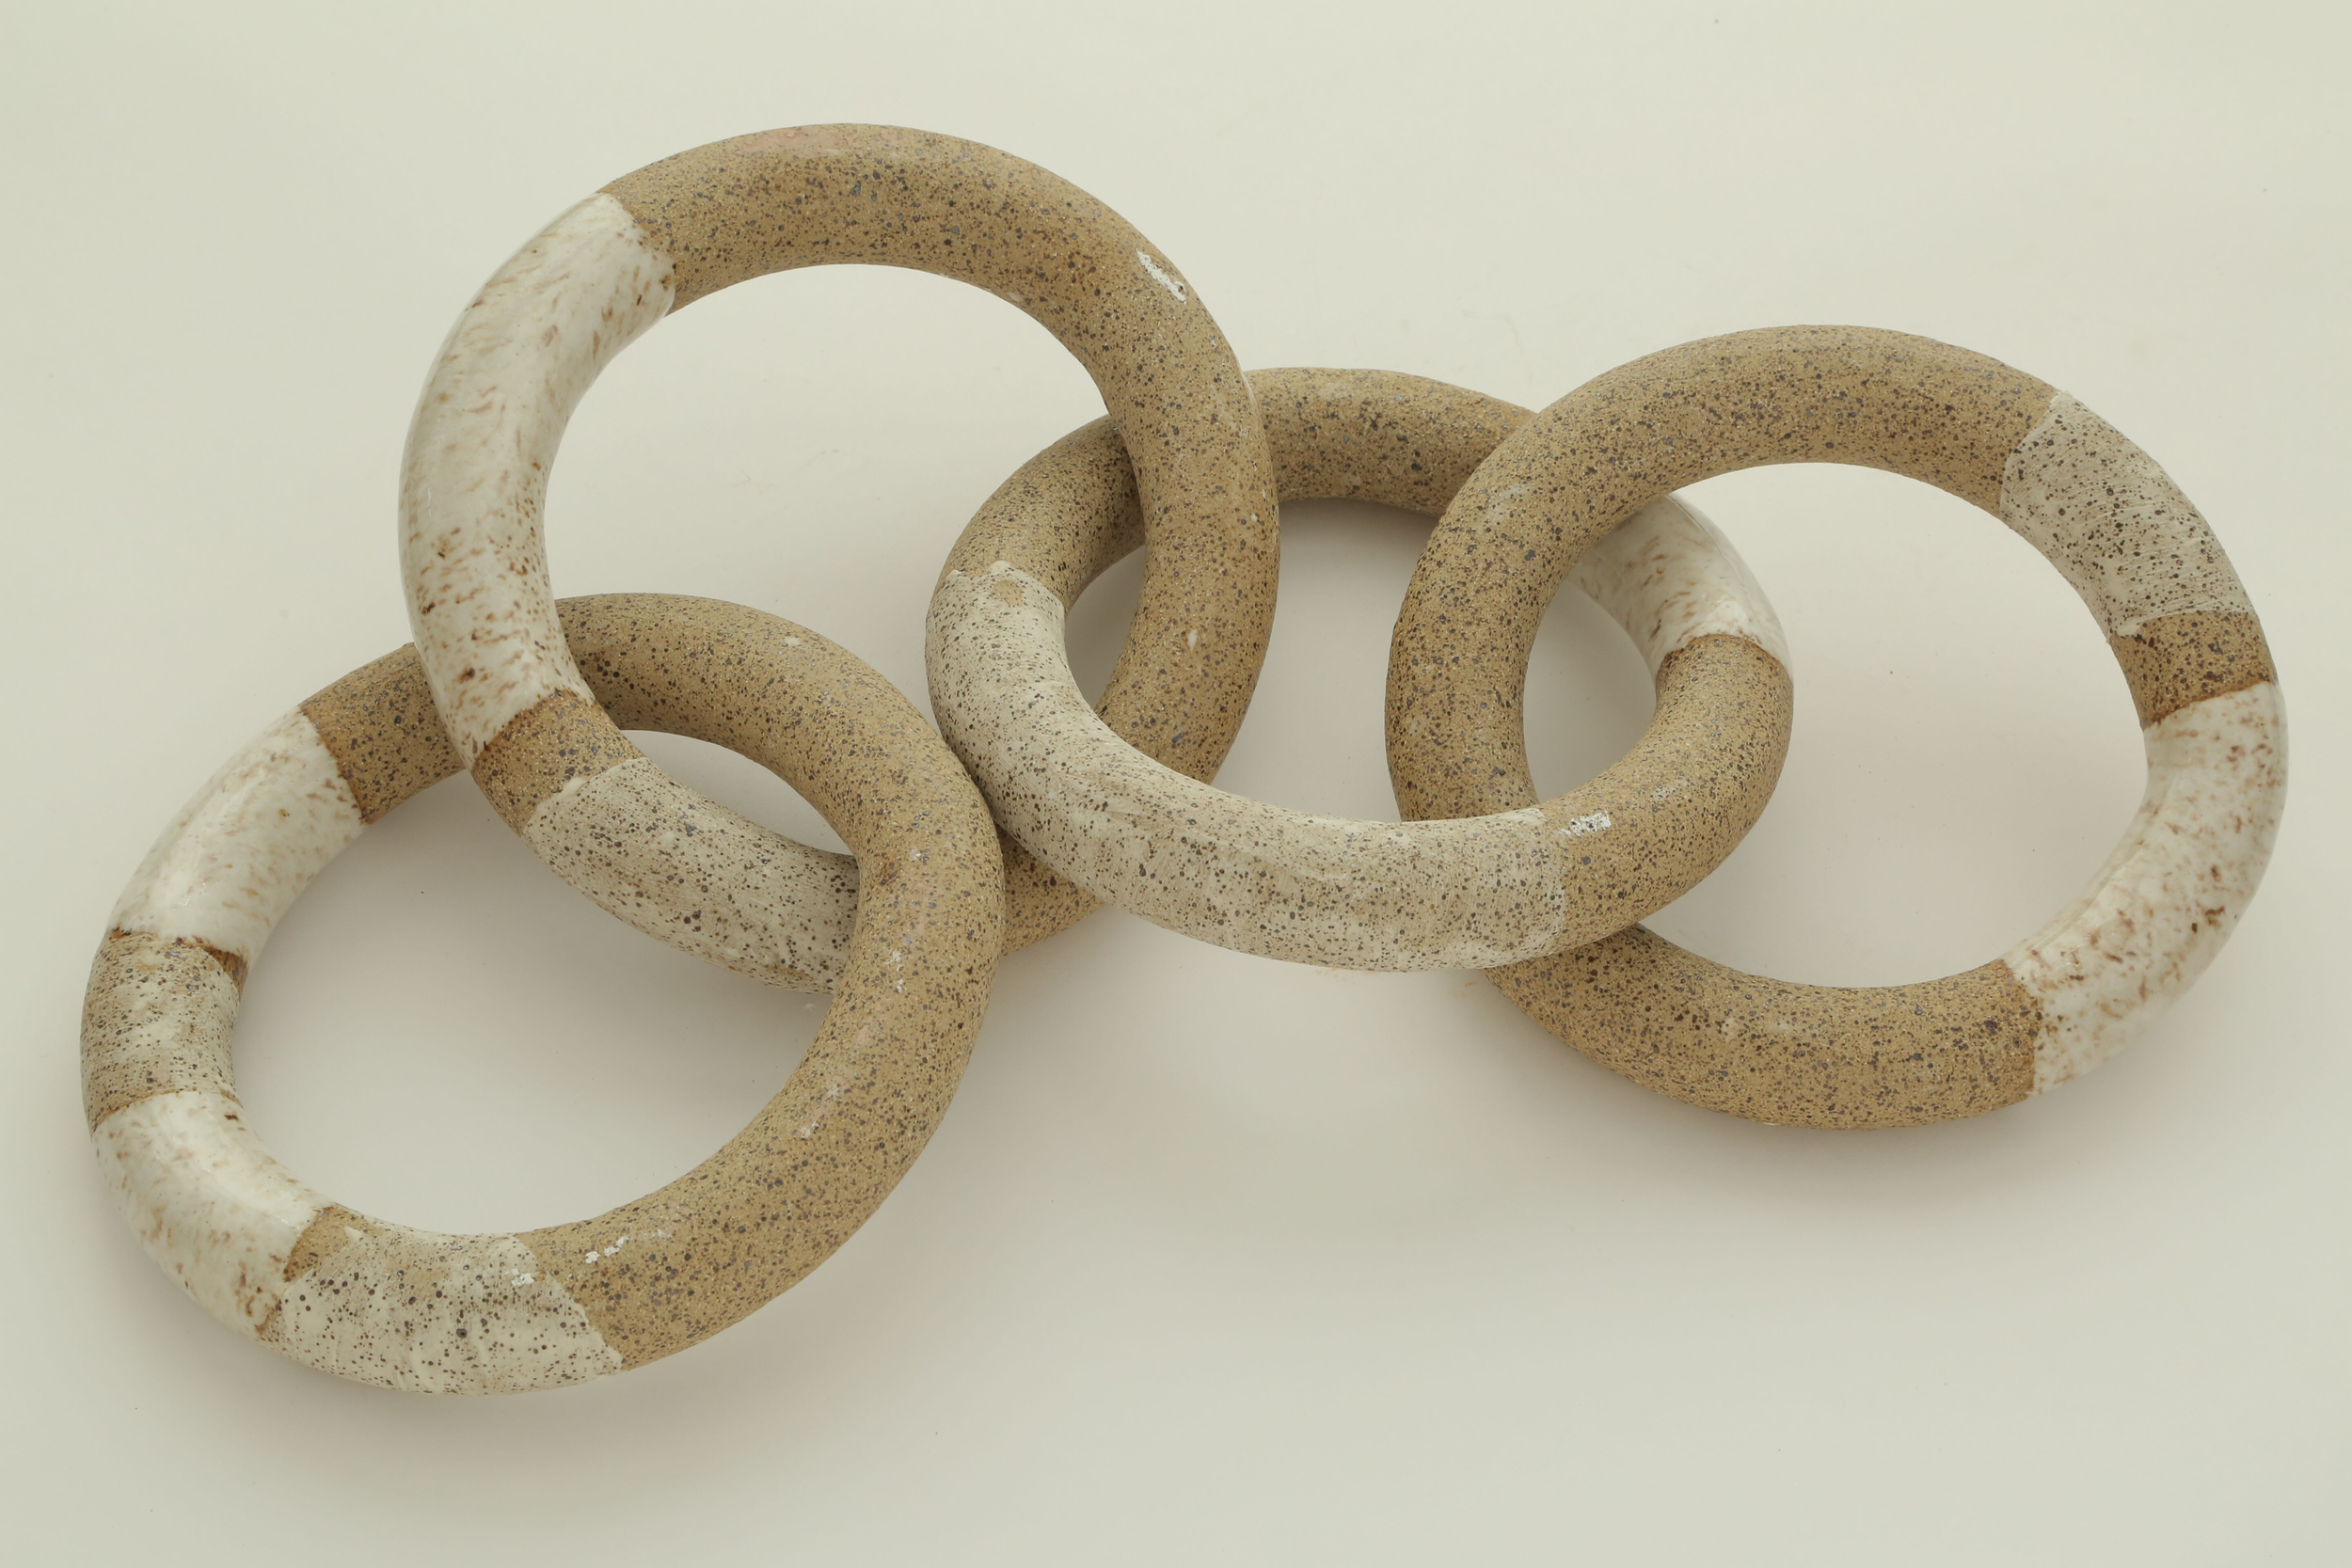 Ceramic Chain (4 Links)